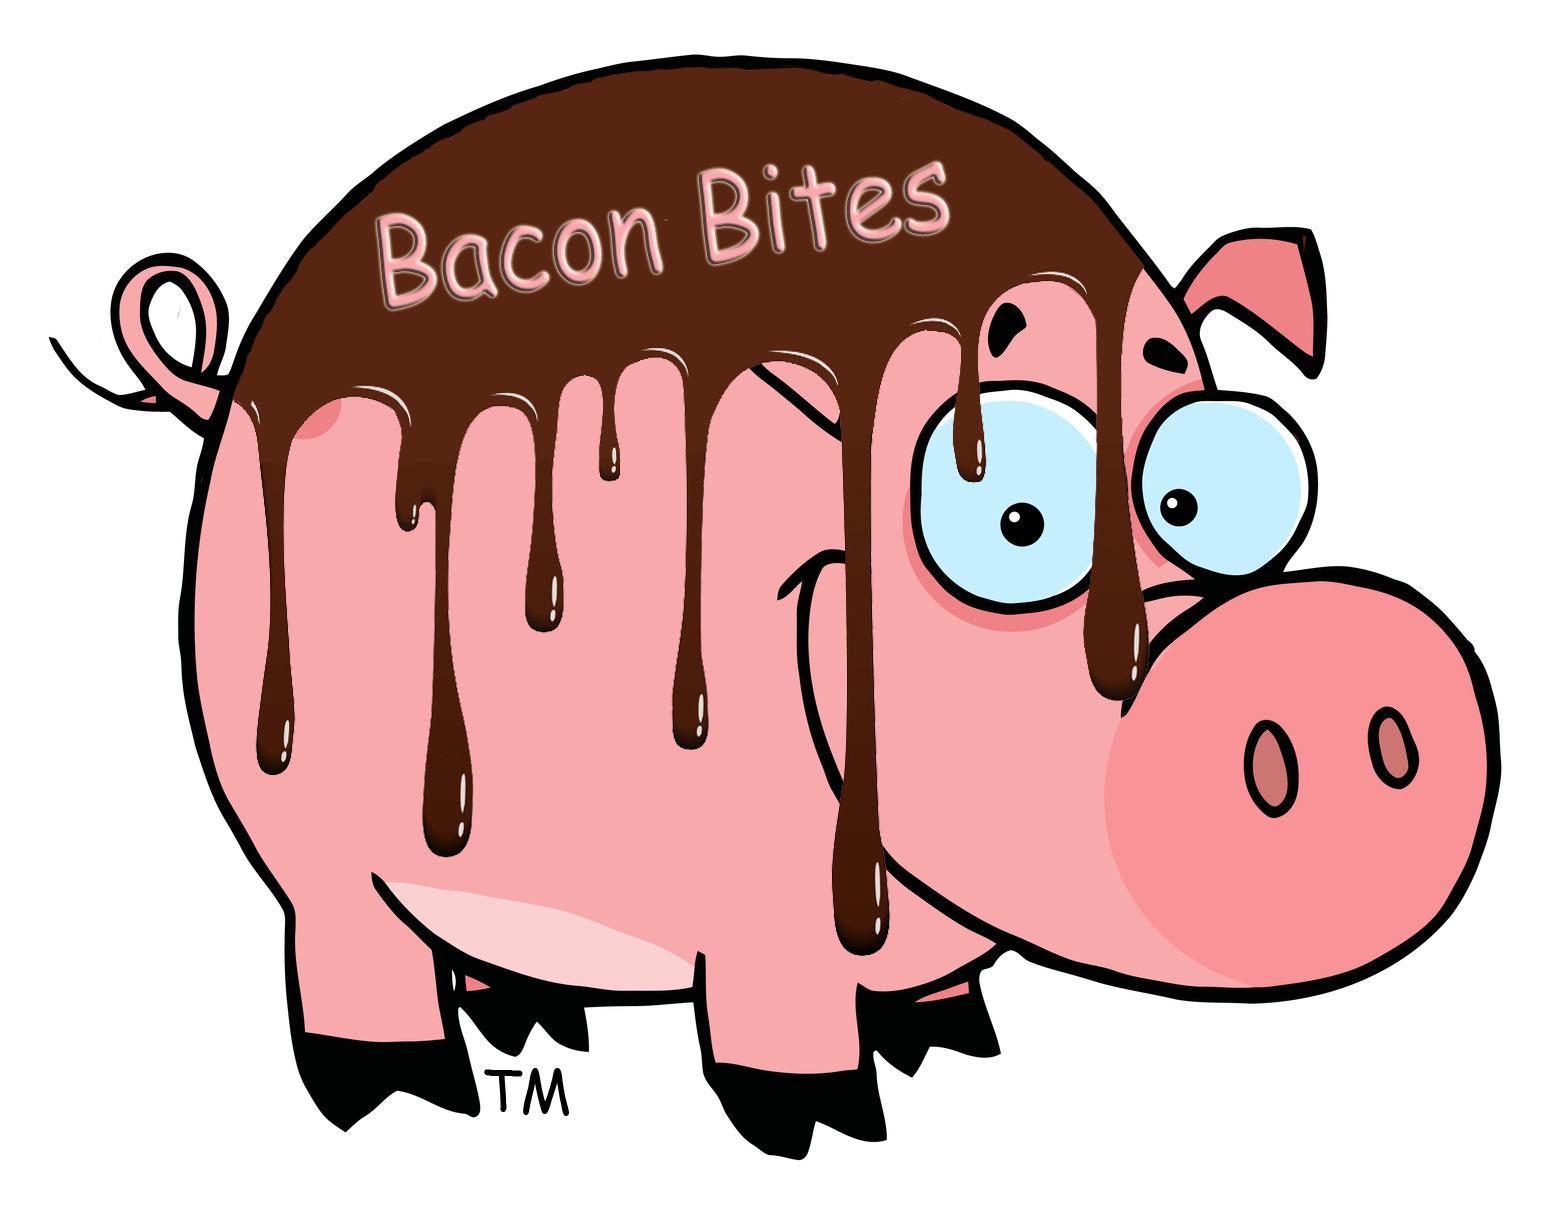 9cfae2c3cf20557fca28_bacon_bites_logo.jpg